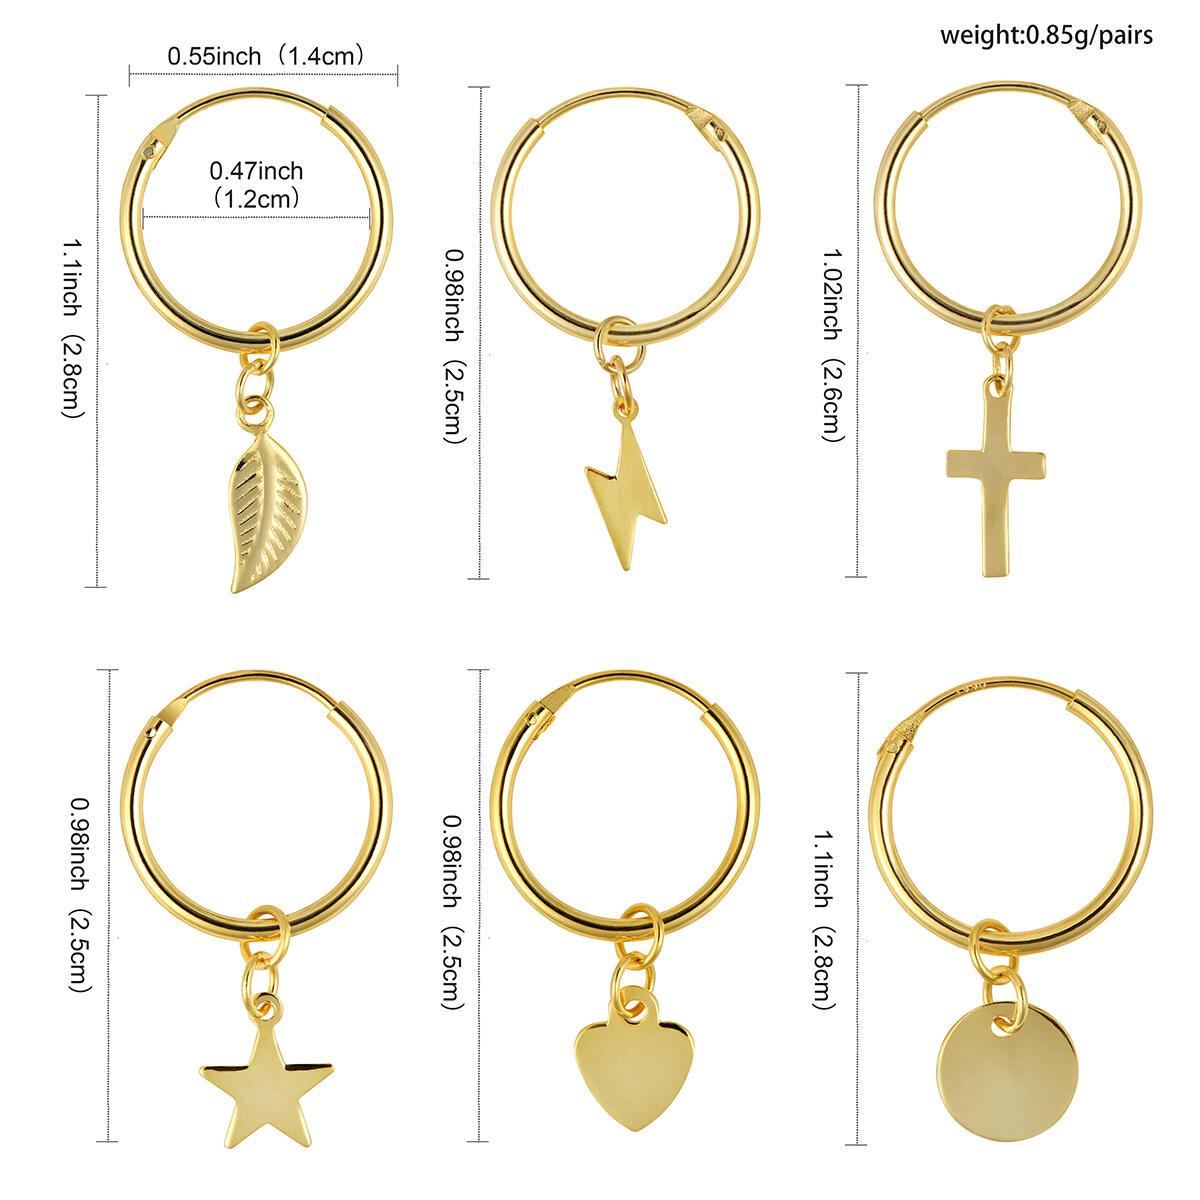 YeGieonr Small Dangle Hoop Earrings-Star Hoop Earrings -925 Sterling Silver with 14k Gold Plated,Minimalist Dainty Huggie Hoop Earrings with Tiny Charms For Women/girls/teens